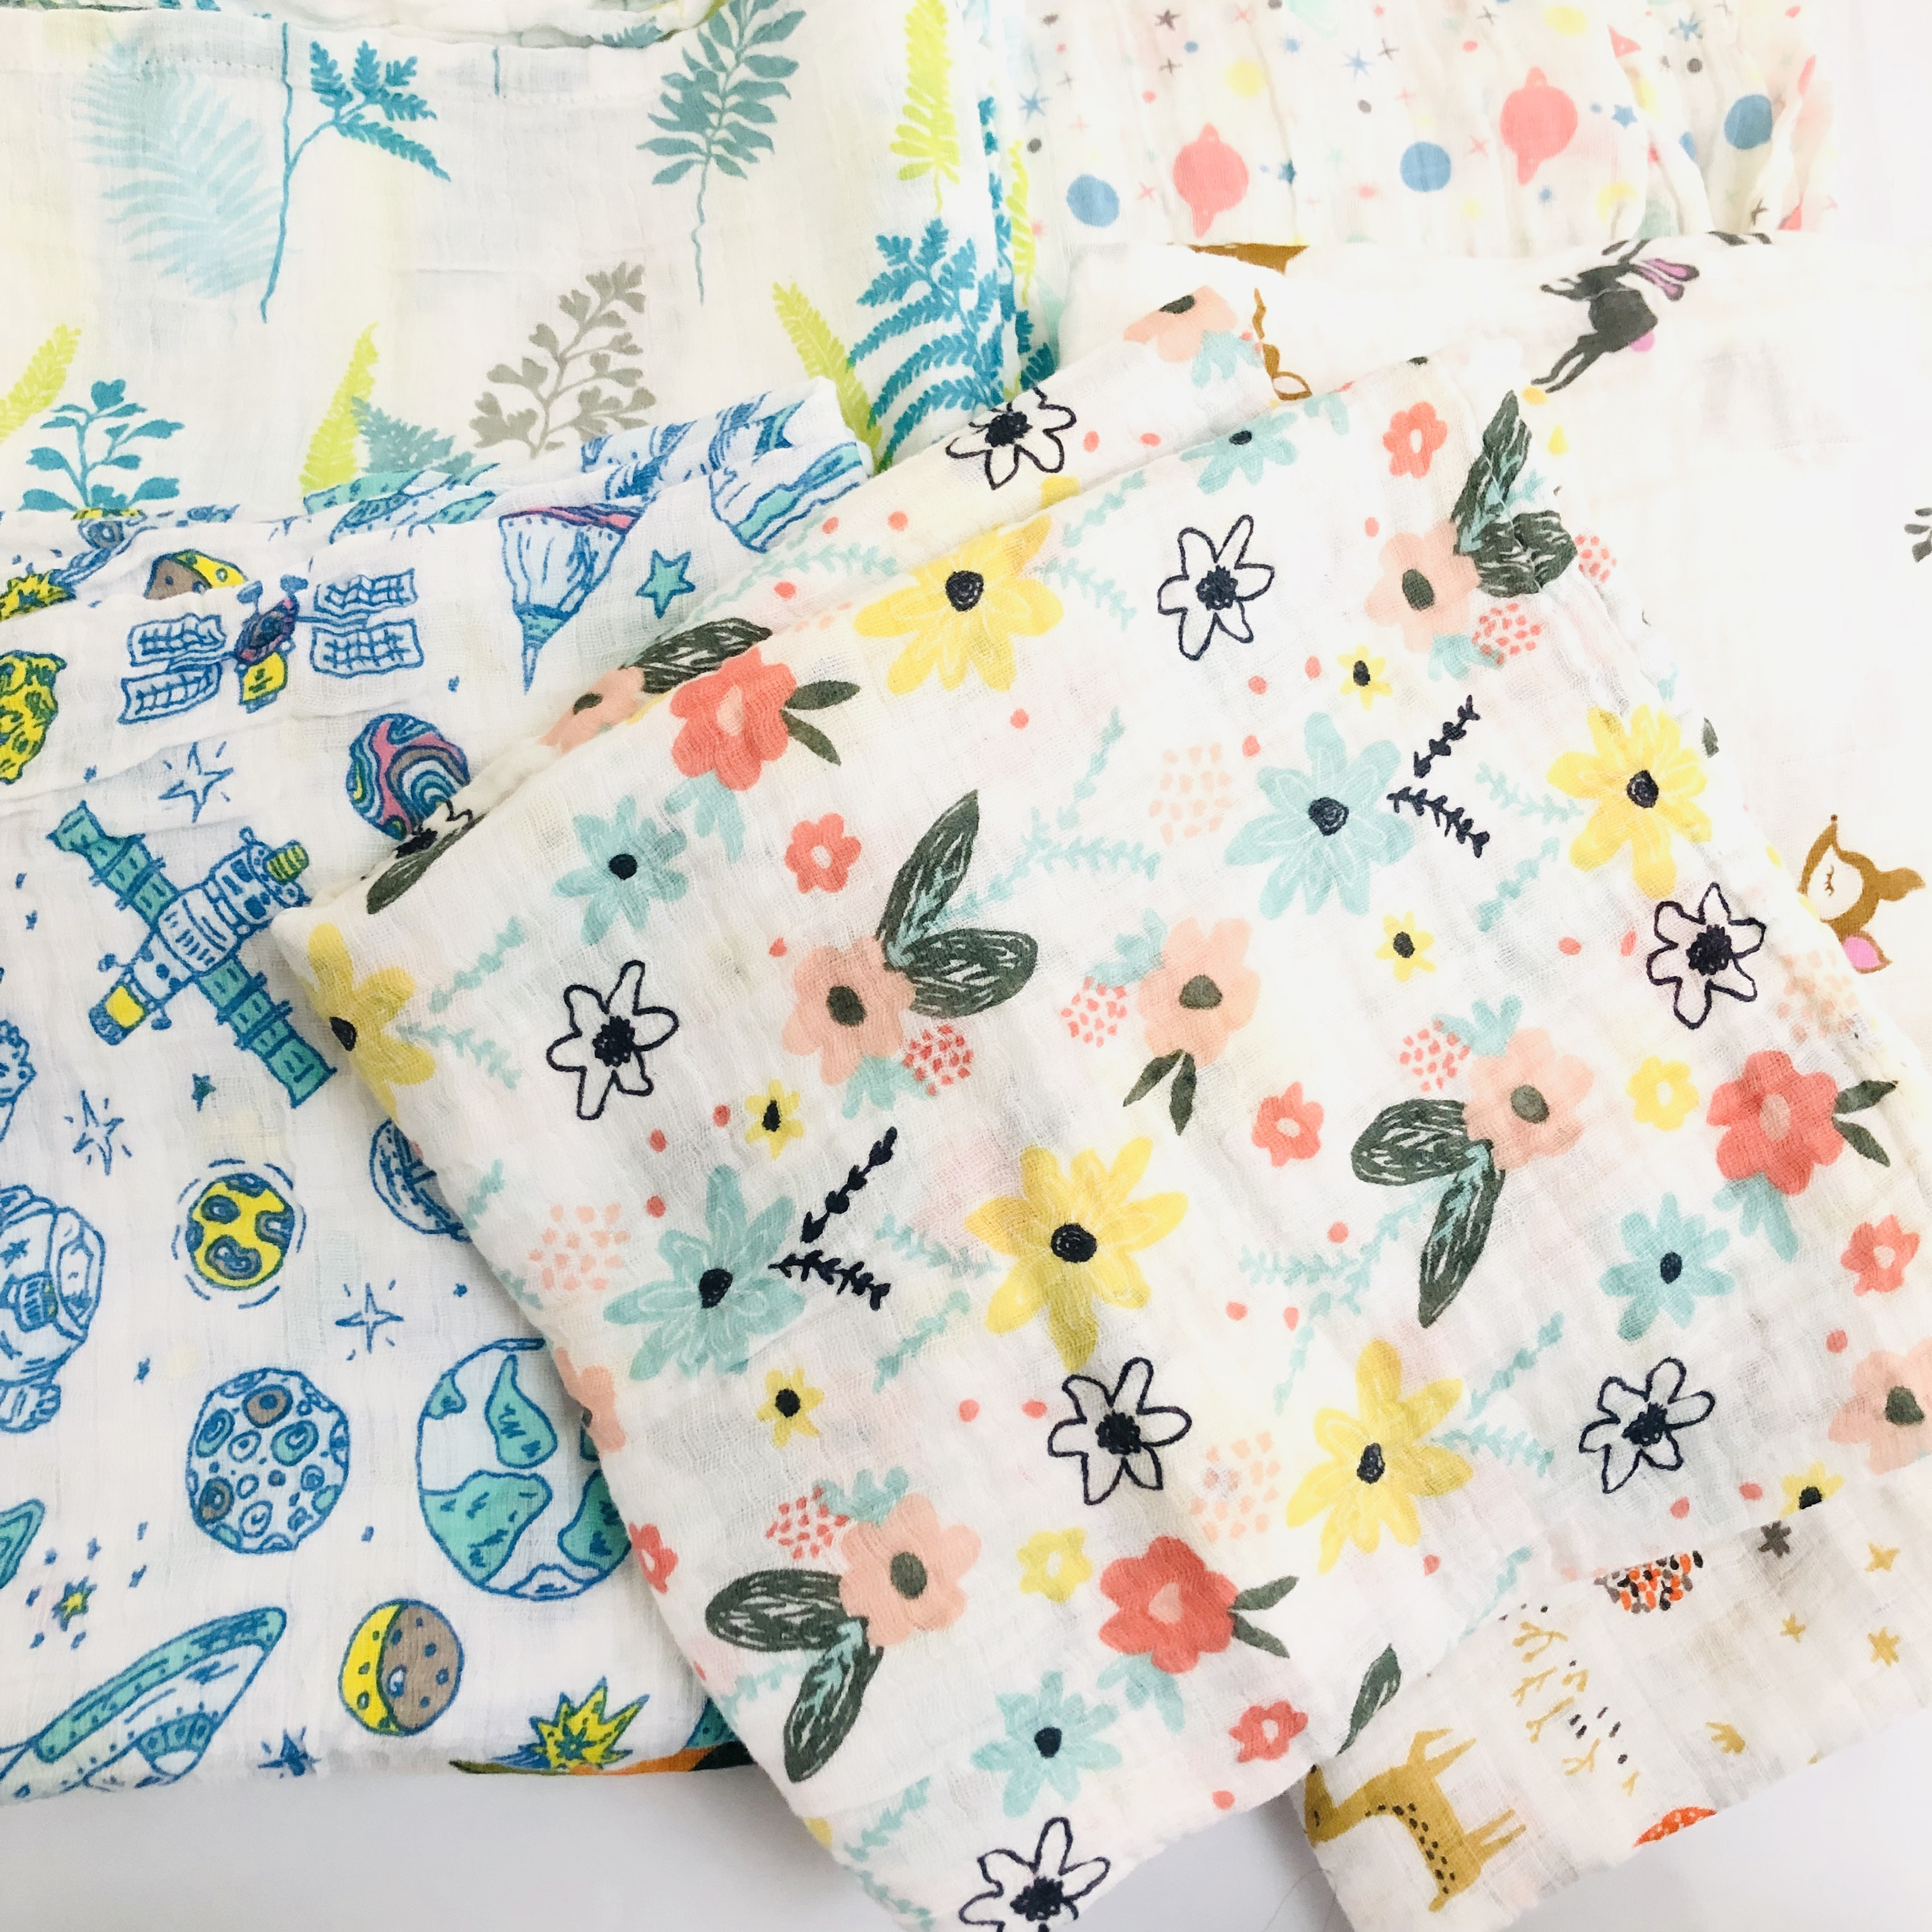 120cm Muslin Swaddle Blanket 100% Cotton Baby Swaddles Newborn Blankets Bath Gauze Infant Wrap Sleepsack Stroller Cover Diaper